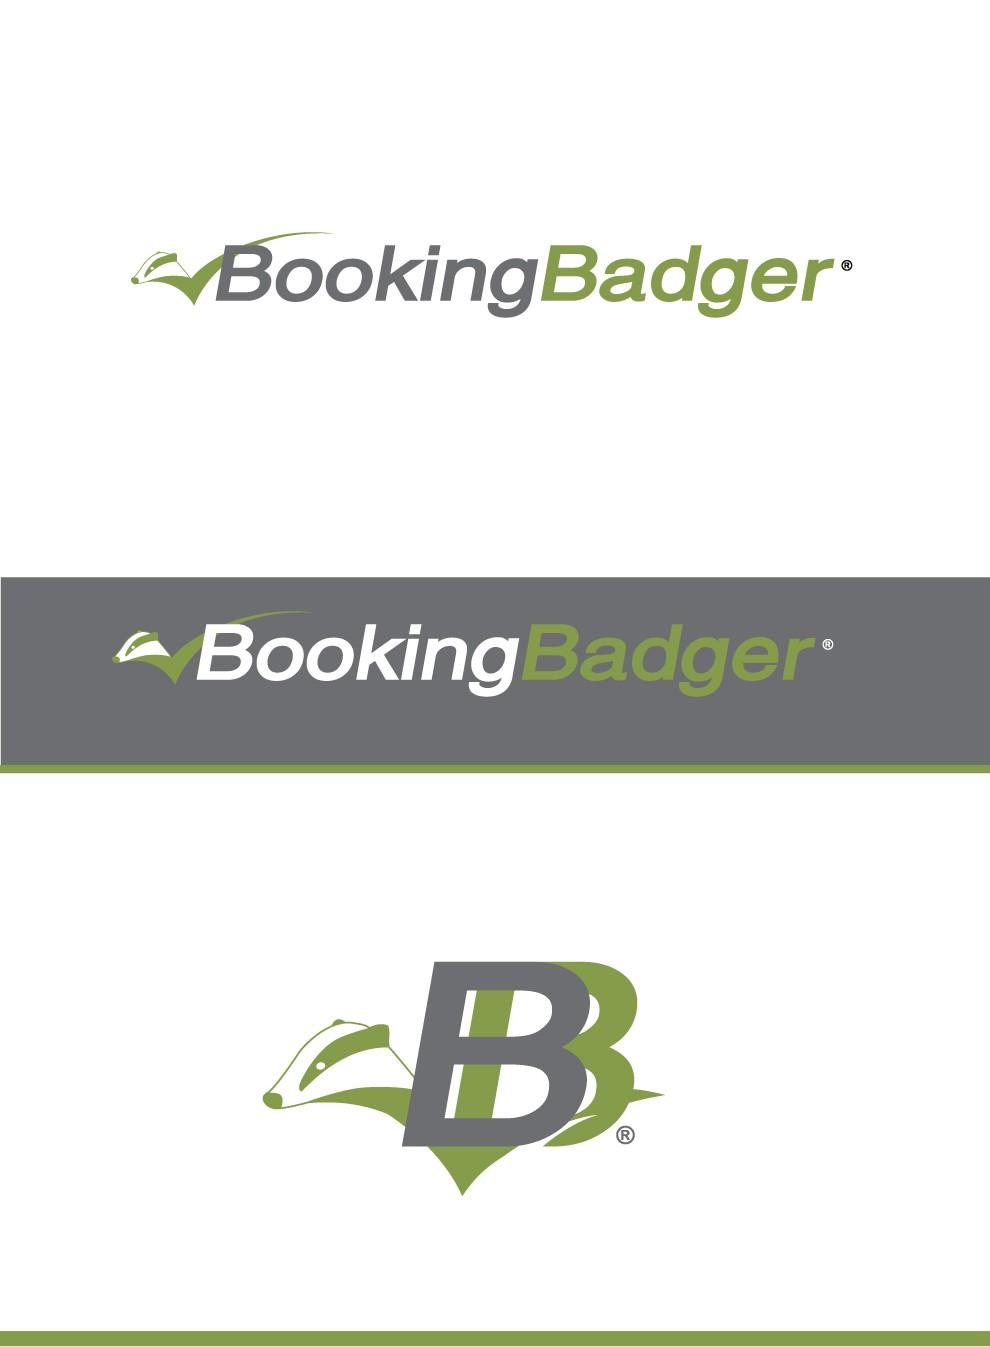 logo for Booking Badger